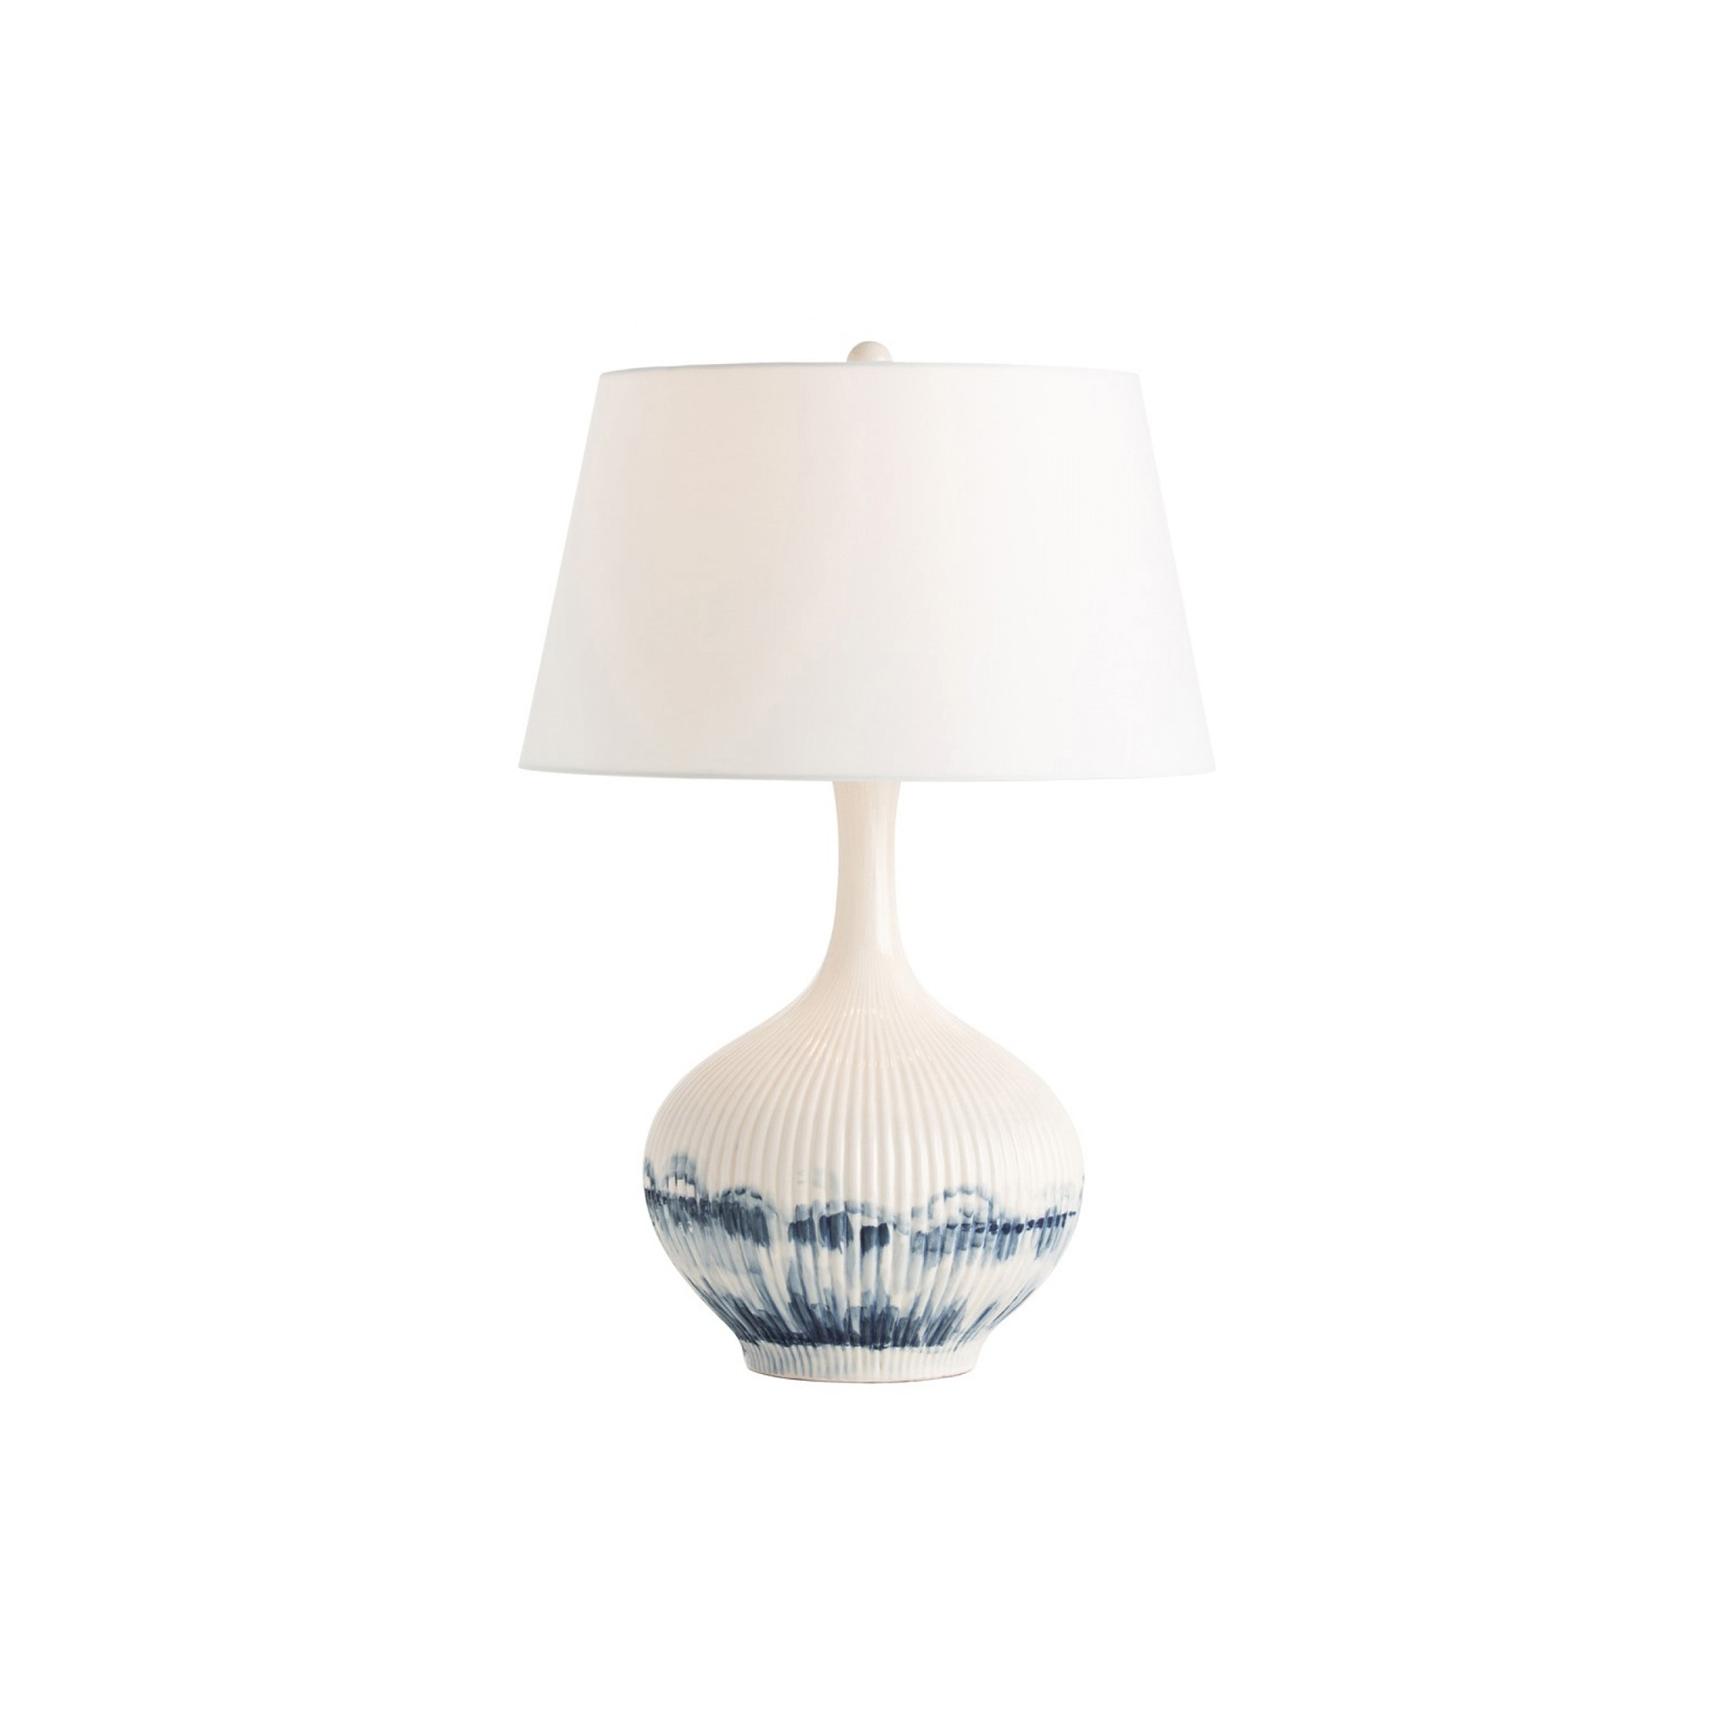 Indigo lamp.jpg